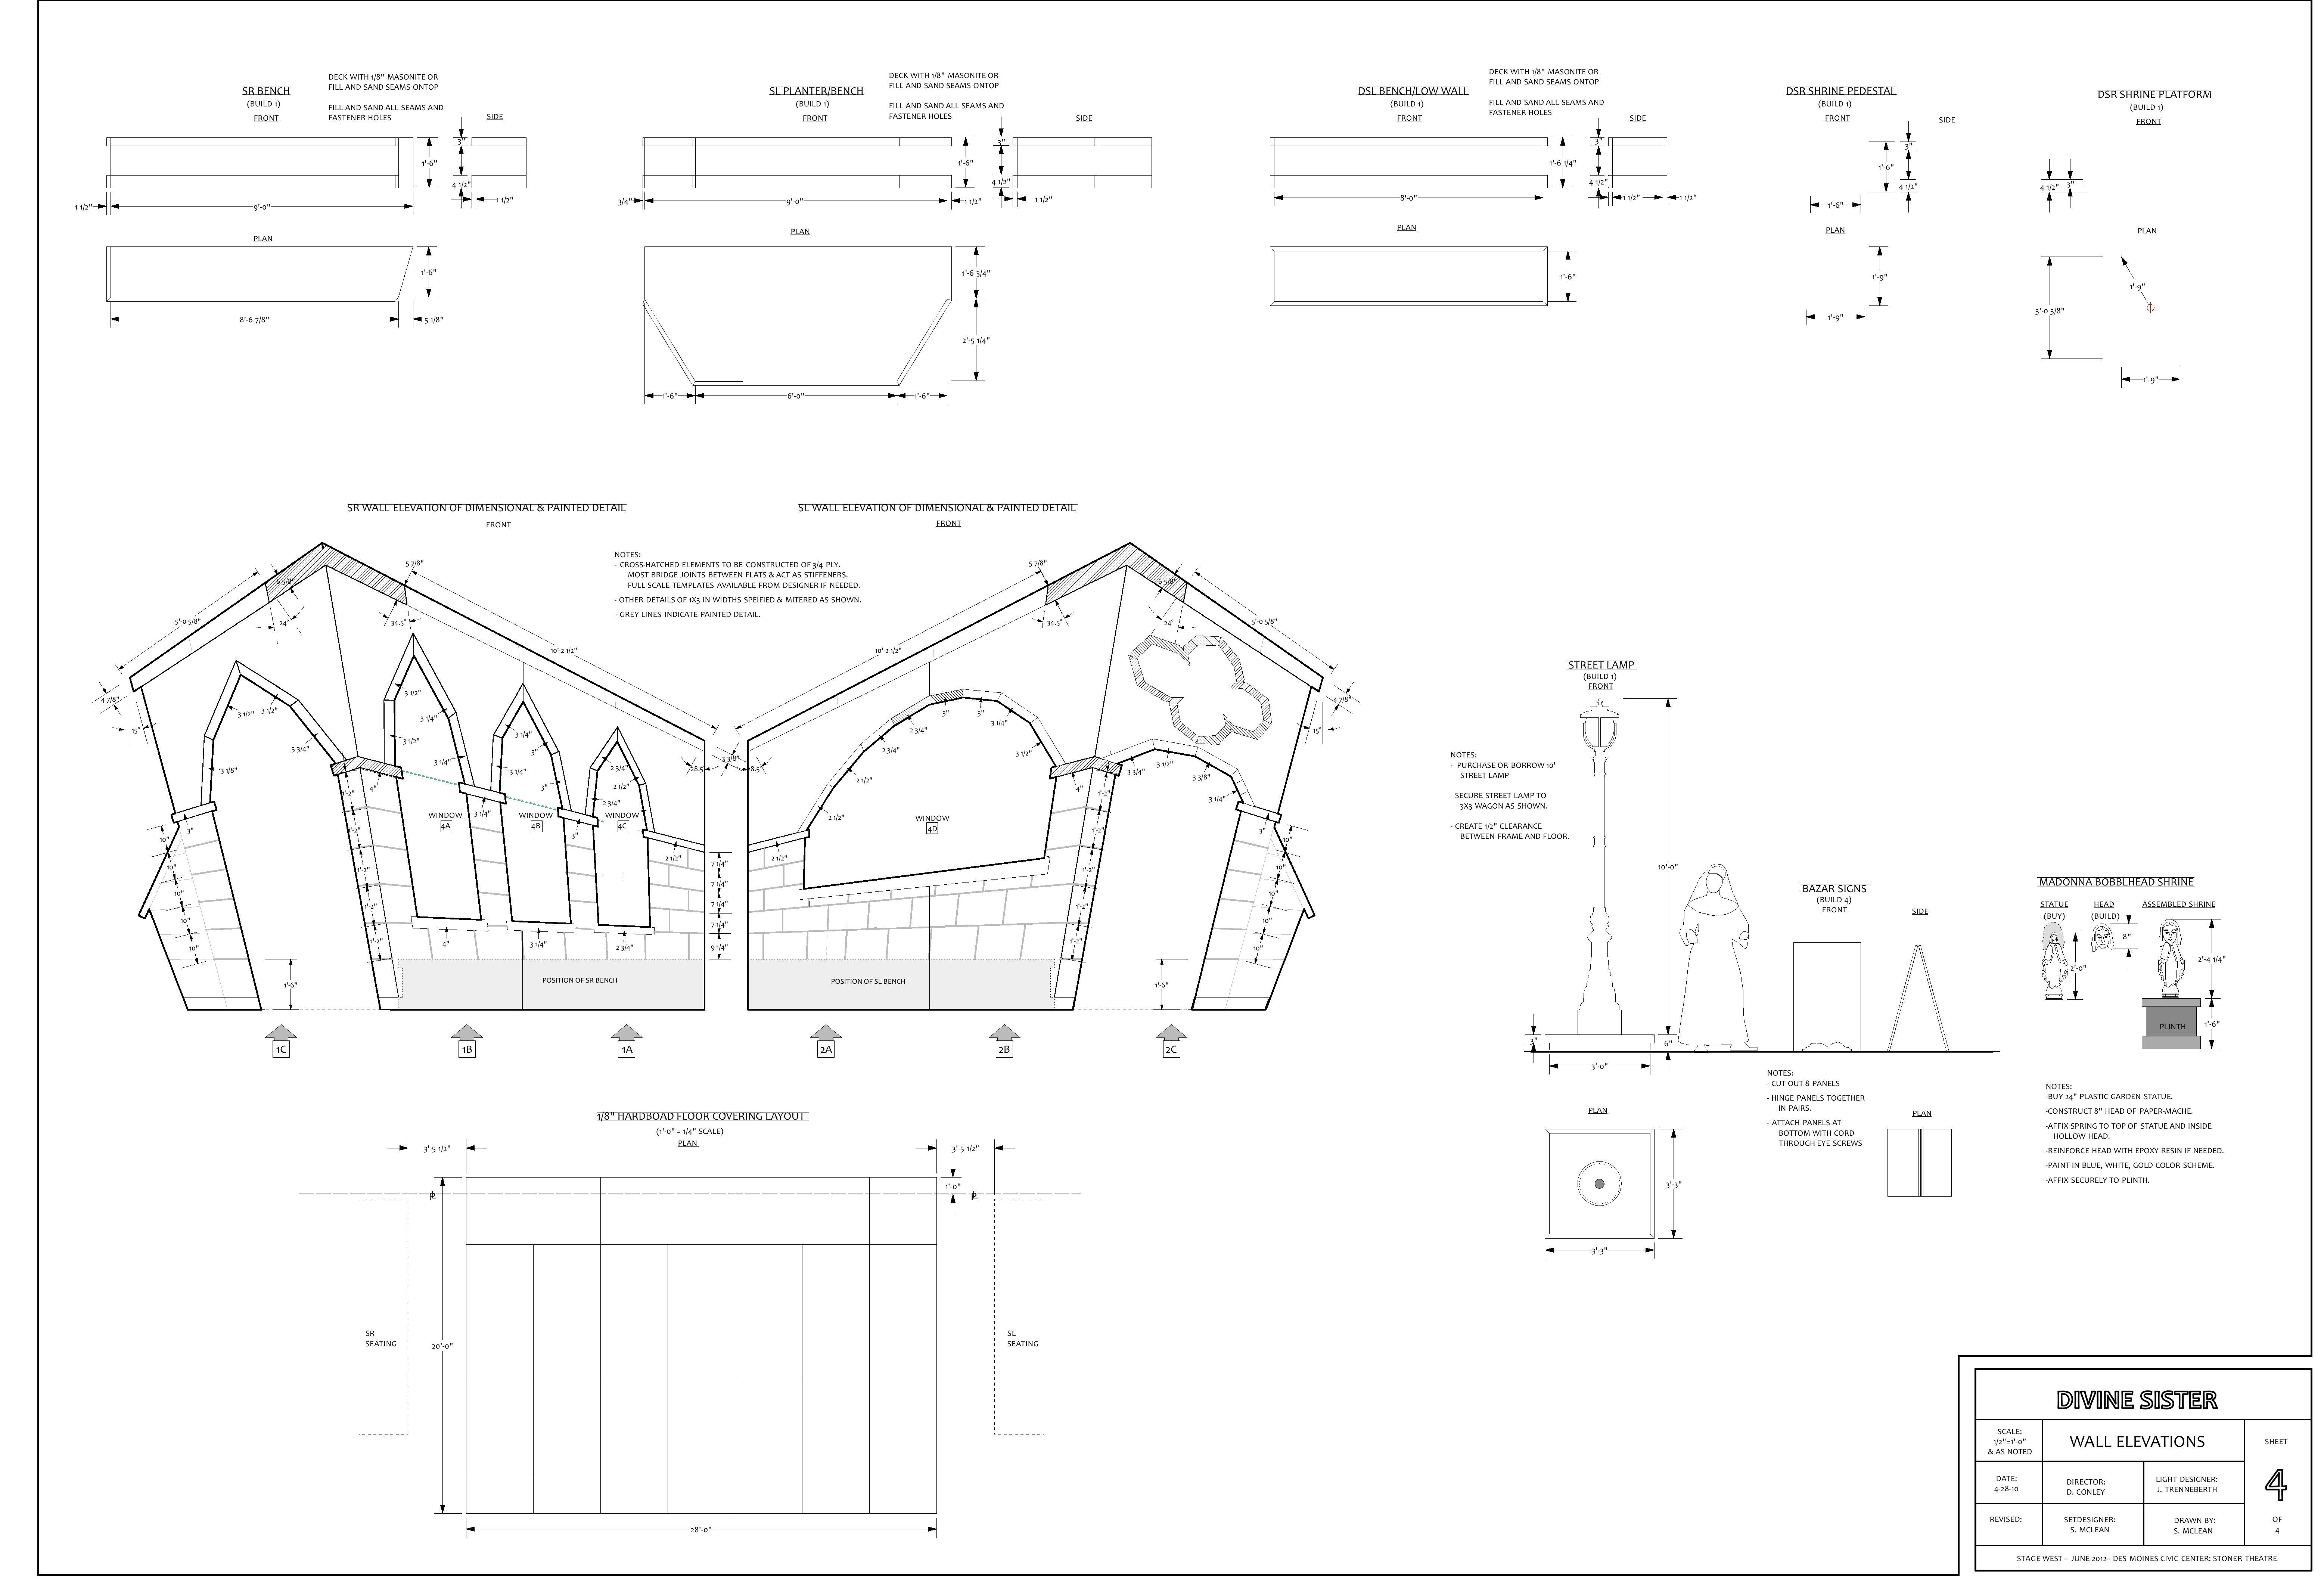 6224x4228 A Set Design For The Divine Sister Designandtechtheatre